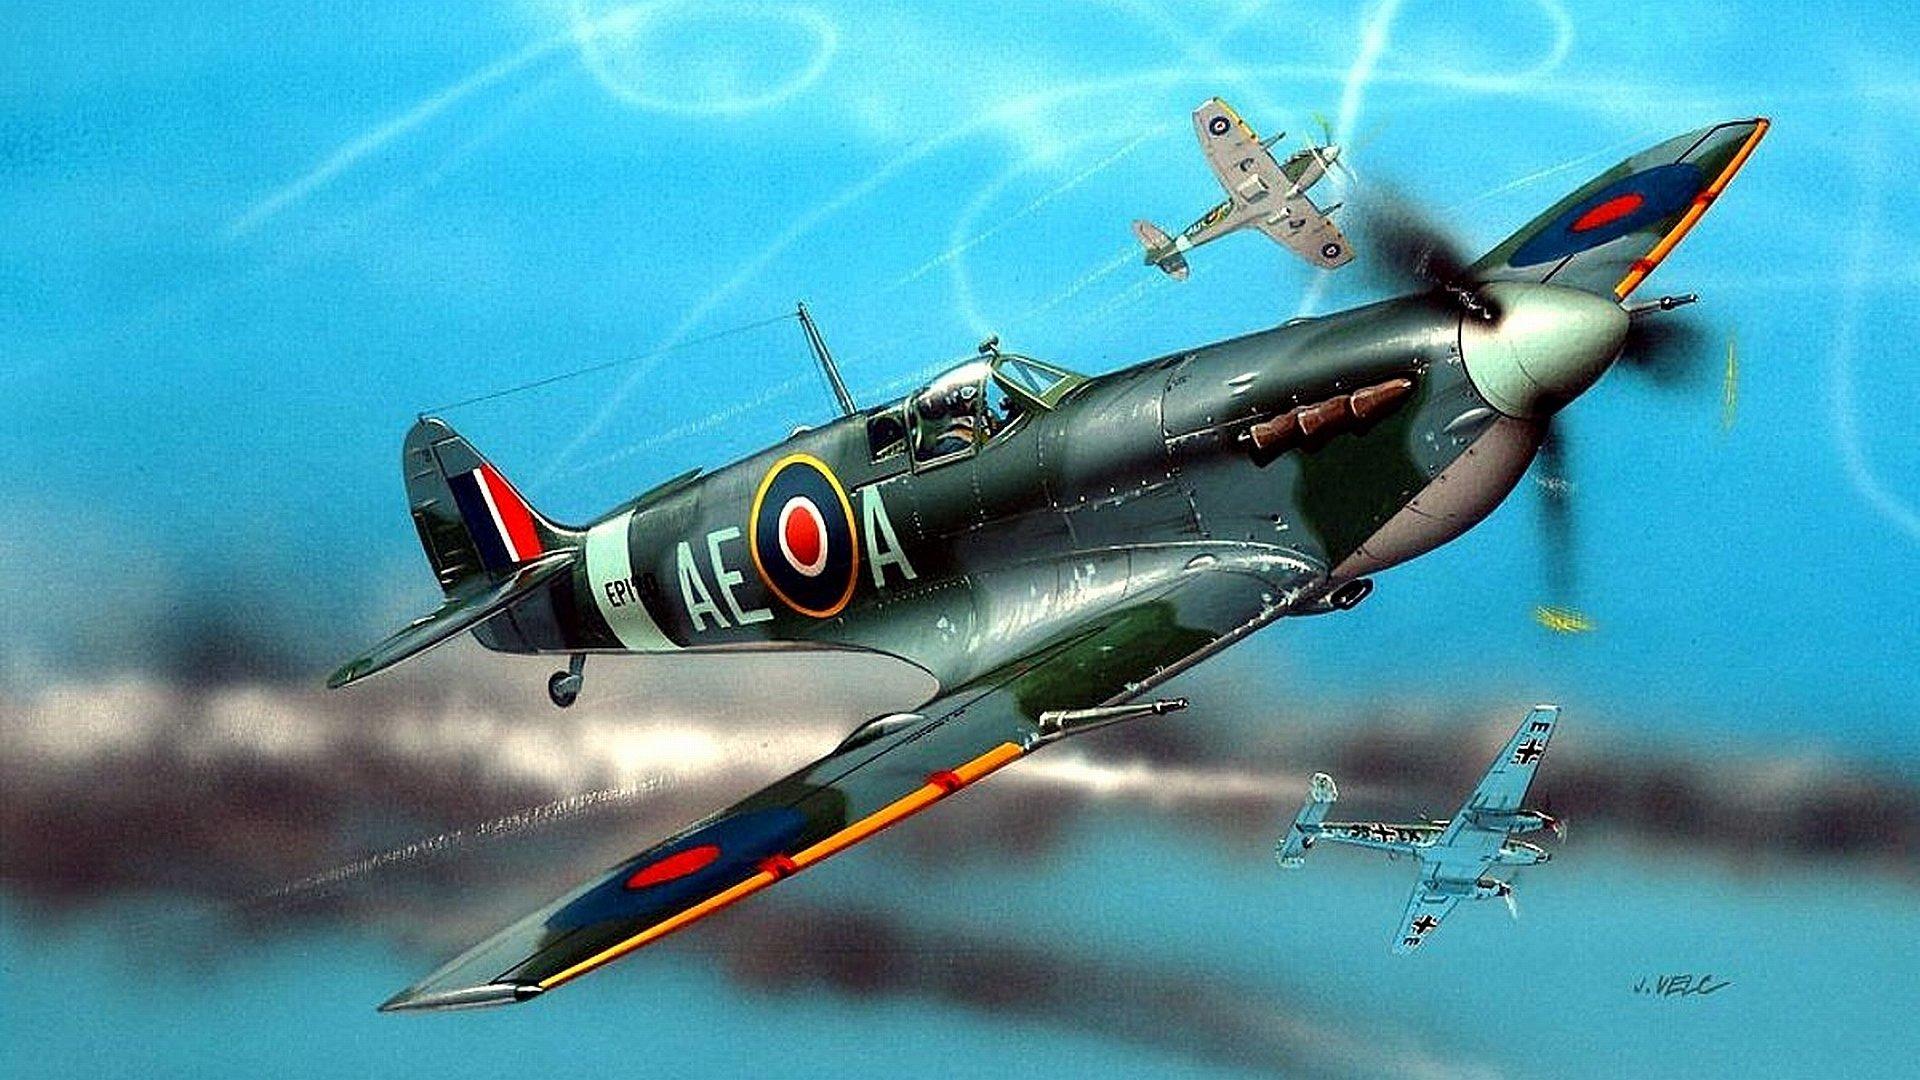 Spitfire Backgrounds